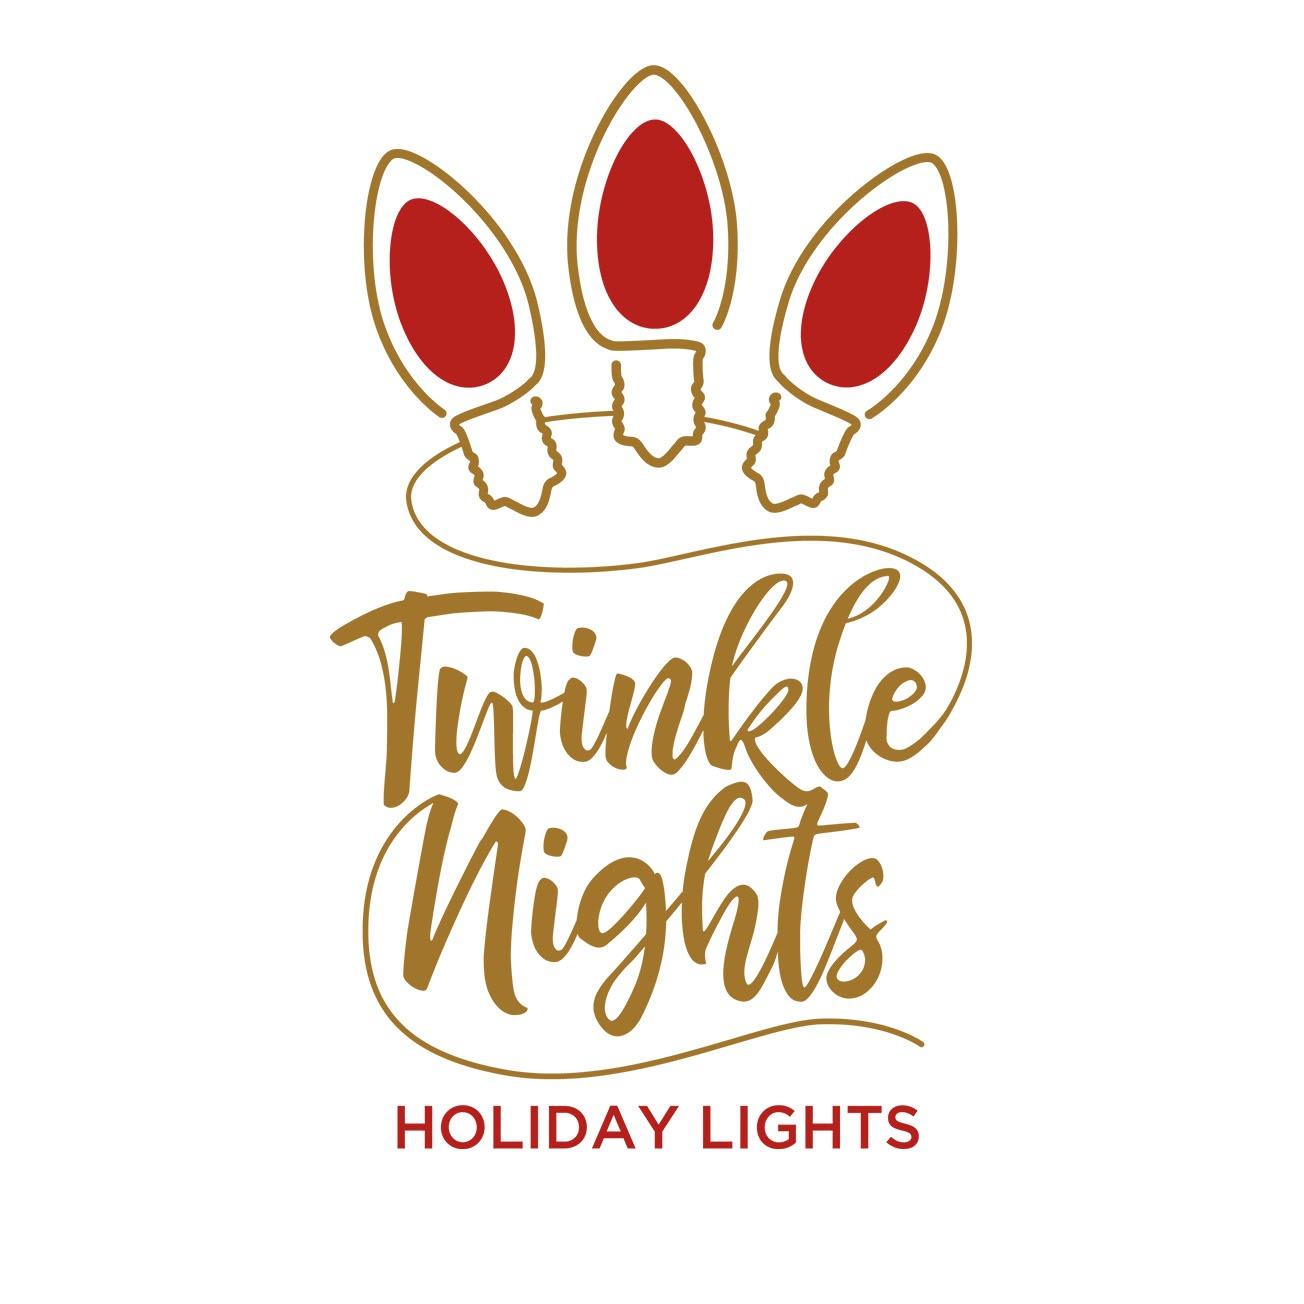 Twinkle Nights Holiday Lights